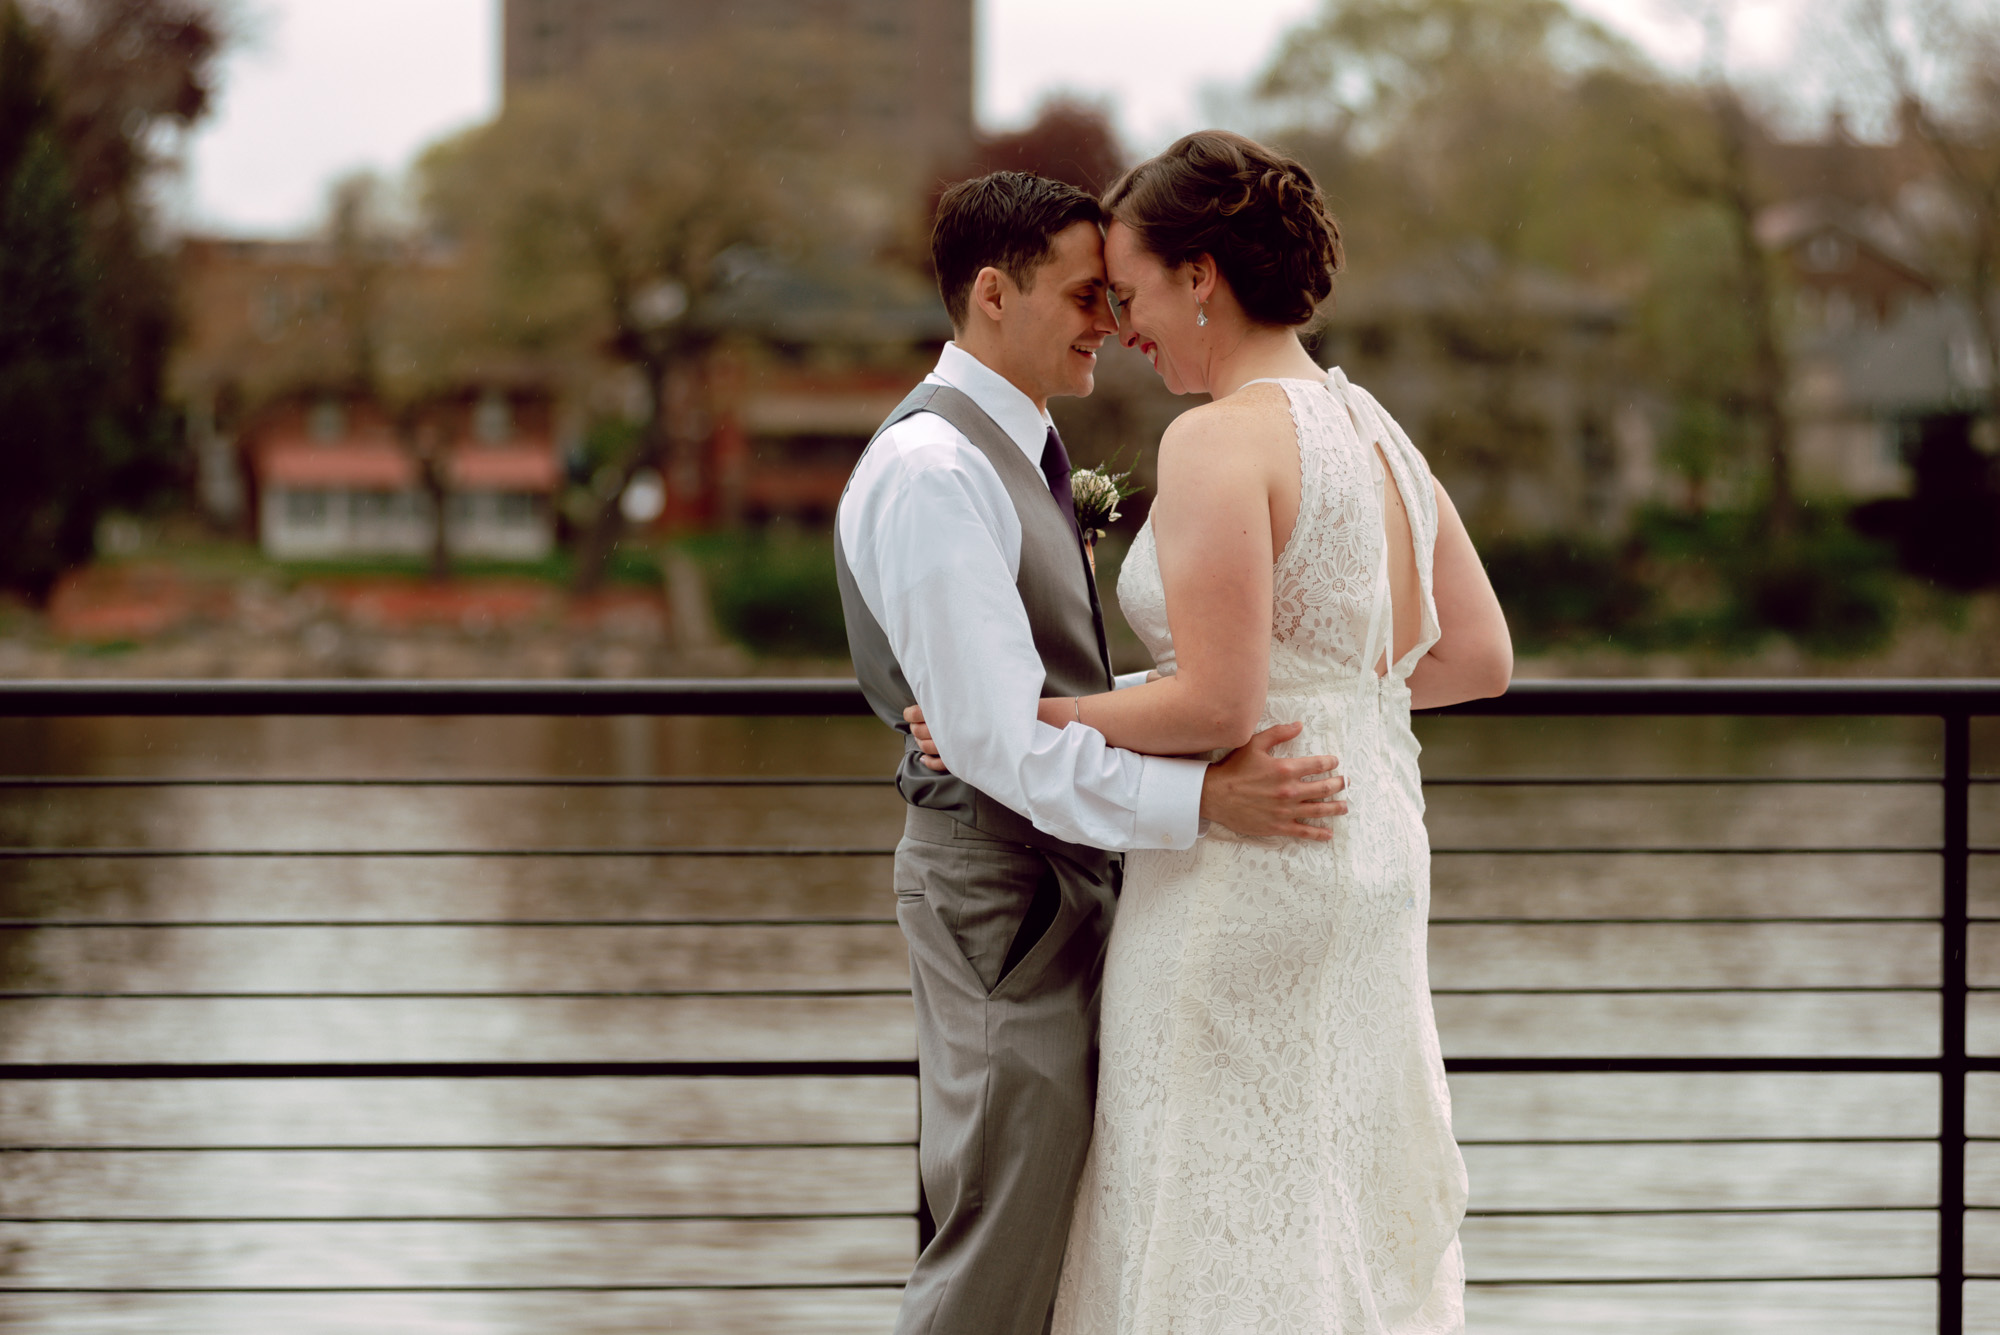 prairie-street-brewhouse-wedding-Rockford-IL-wedding-photographers-66.jpg